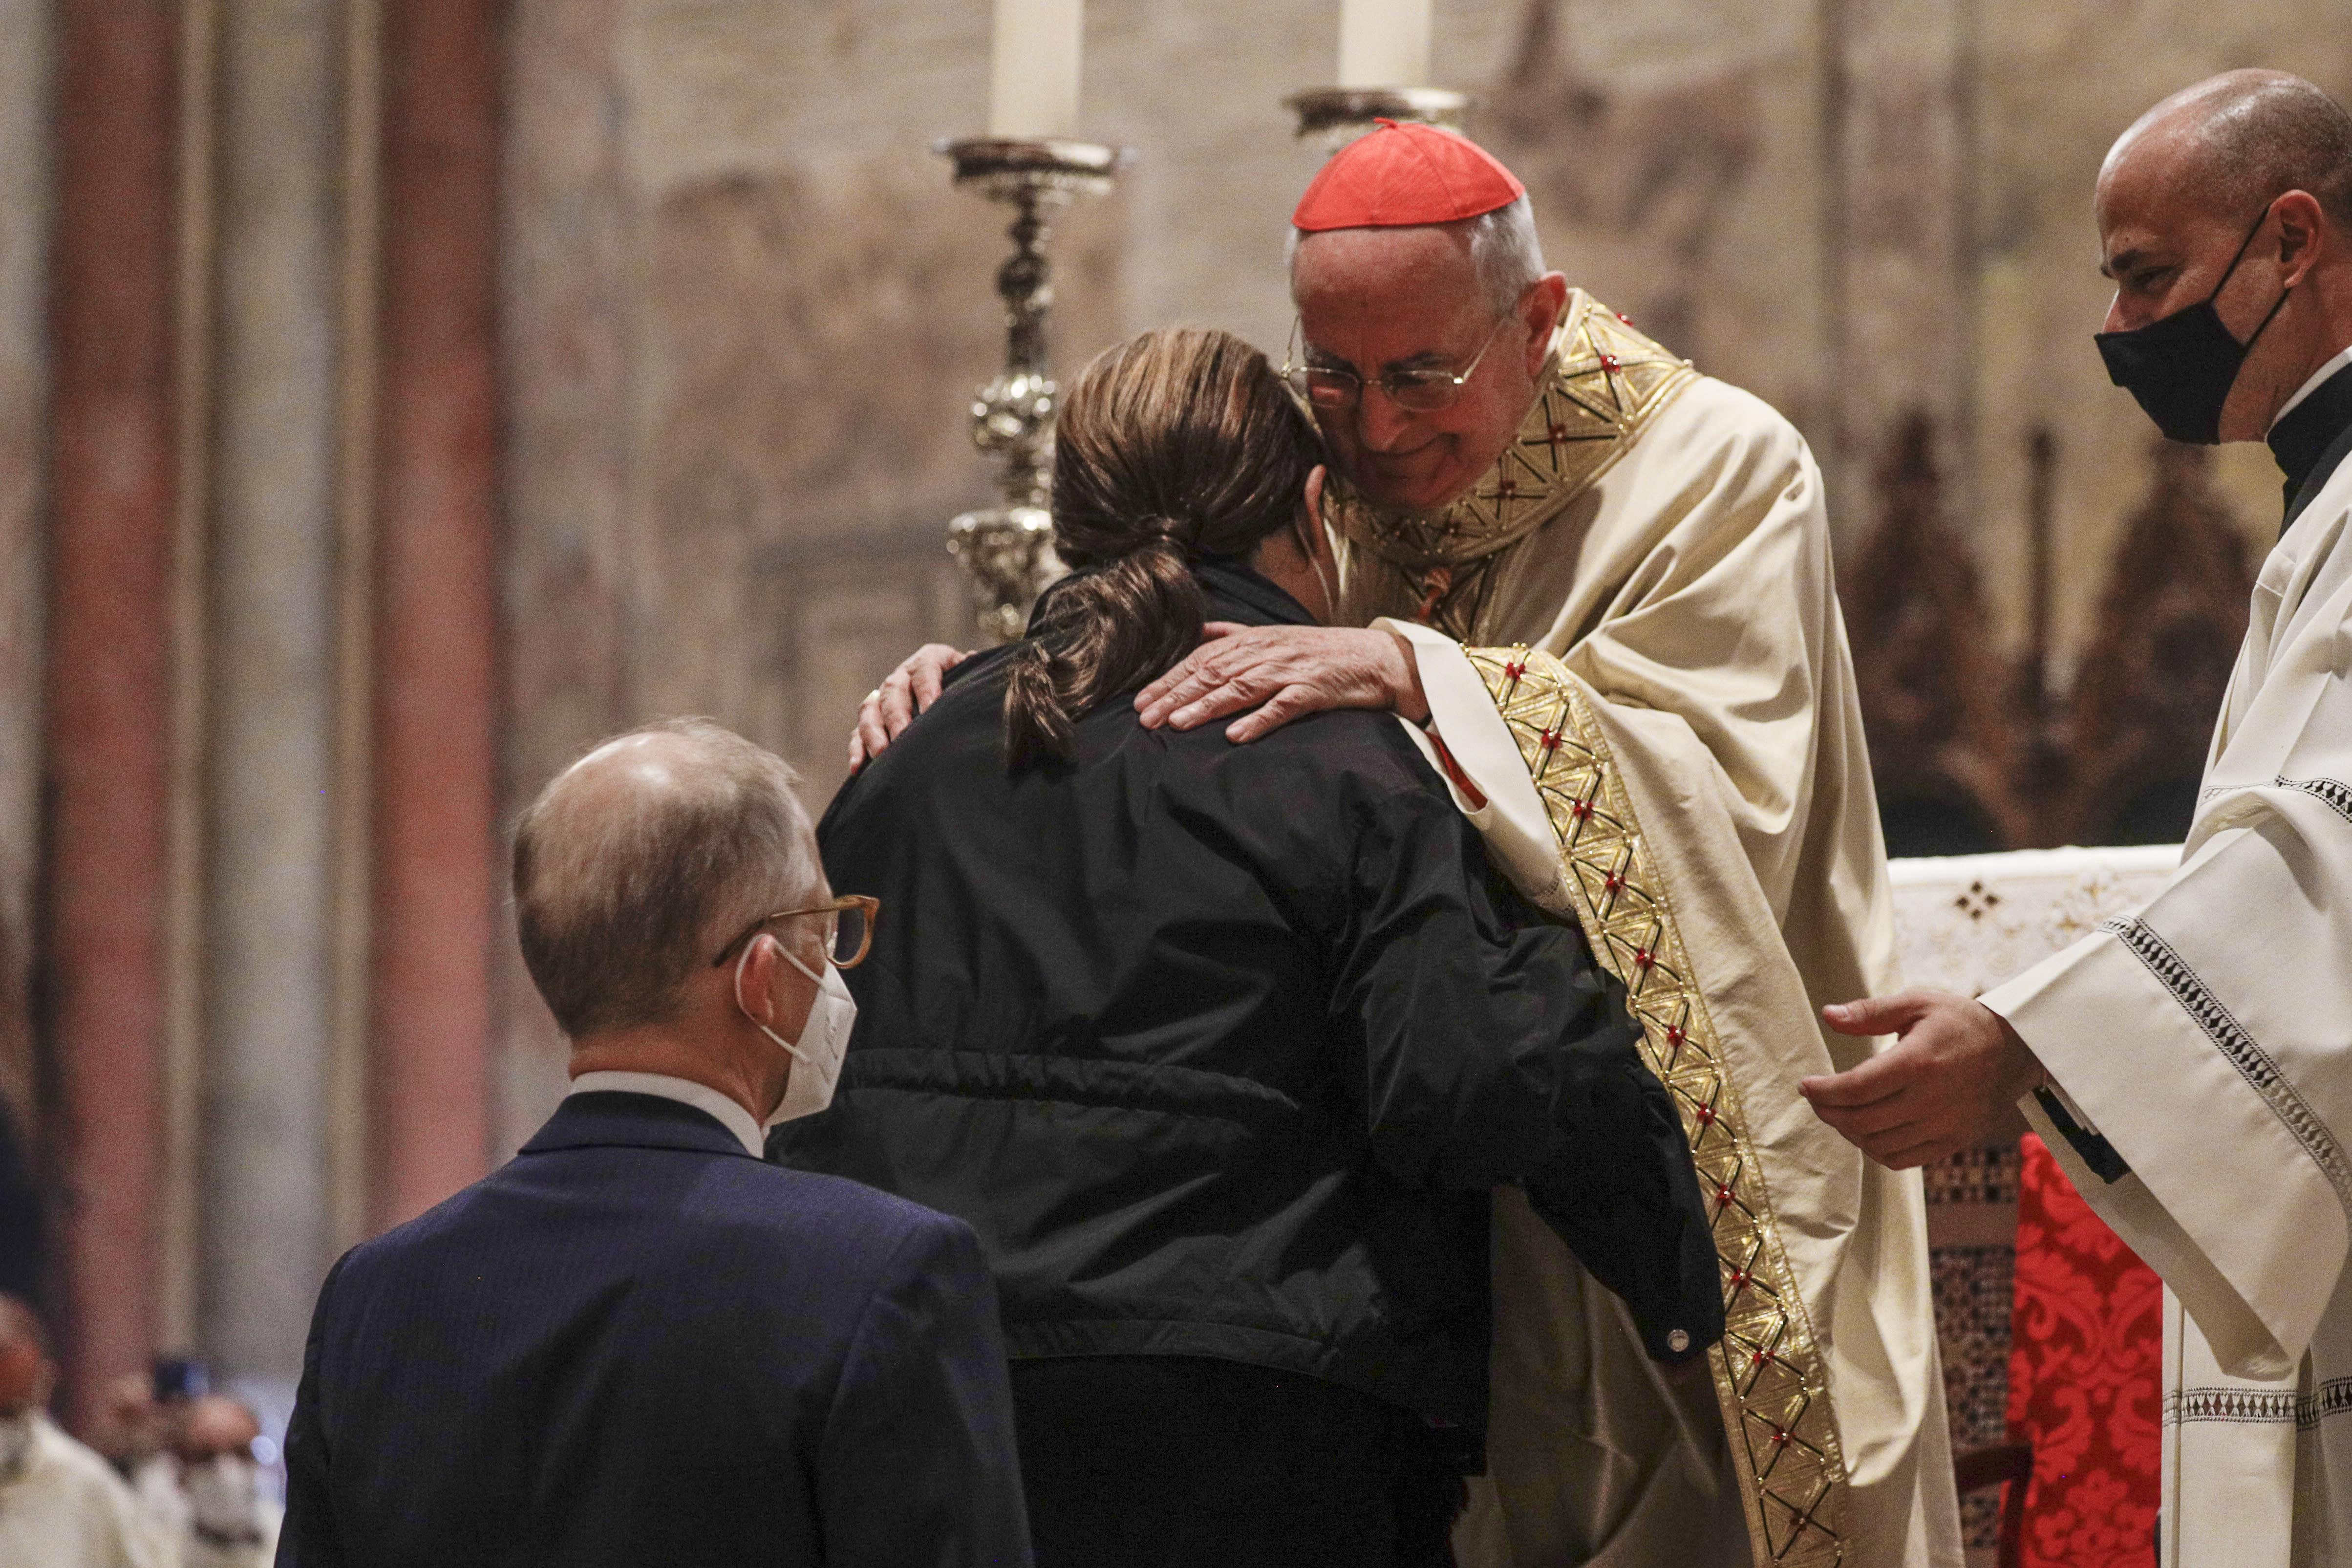 Church: Carlo Acutis, a new saint for Internet users?